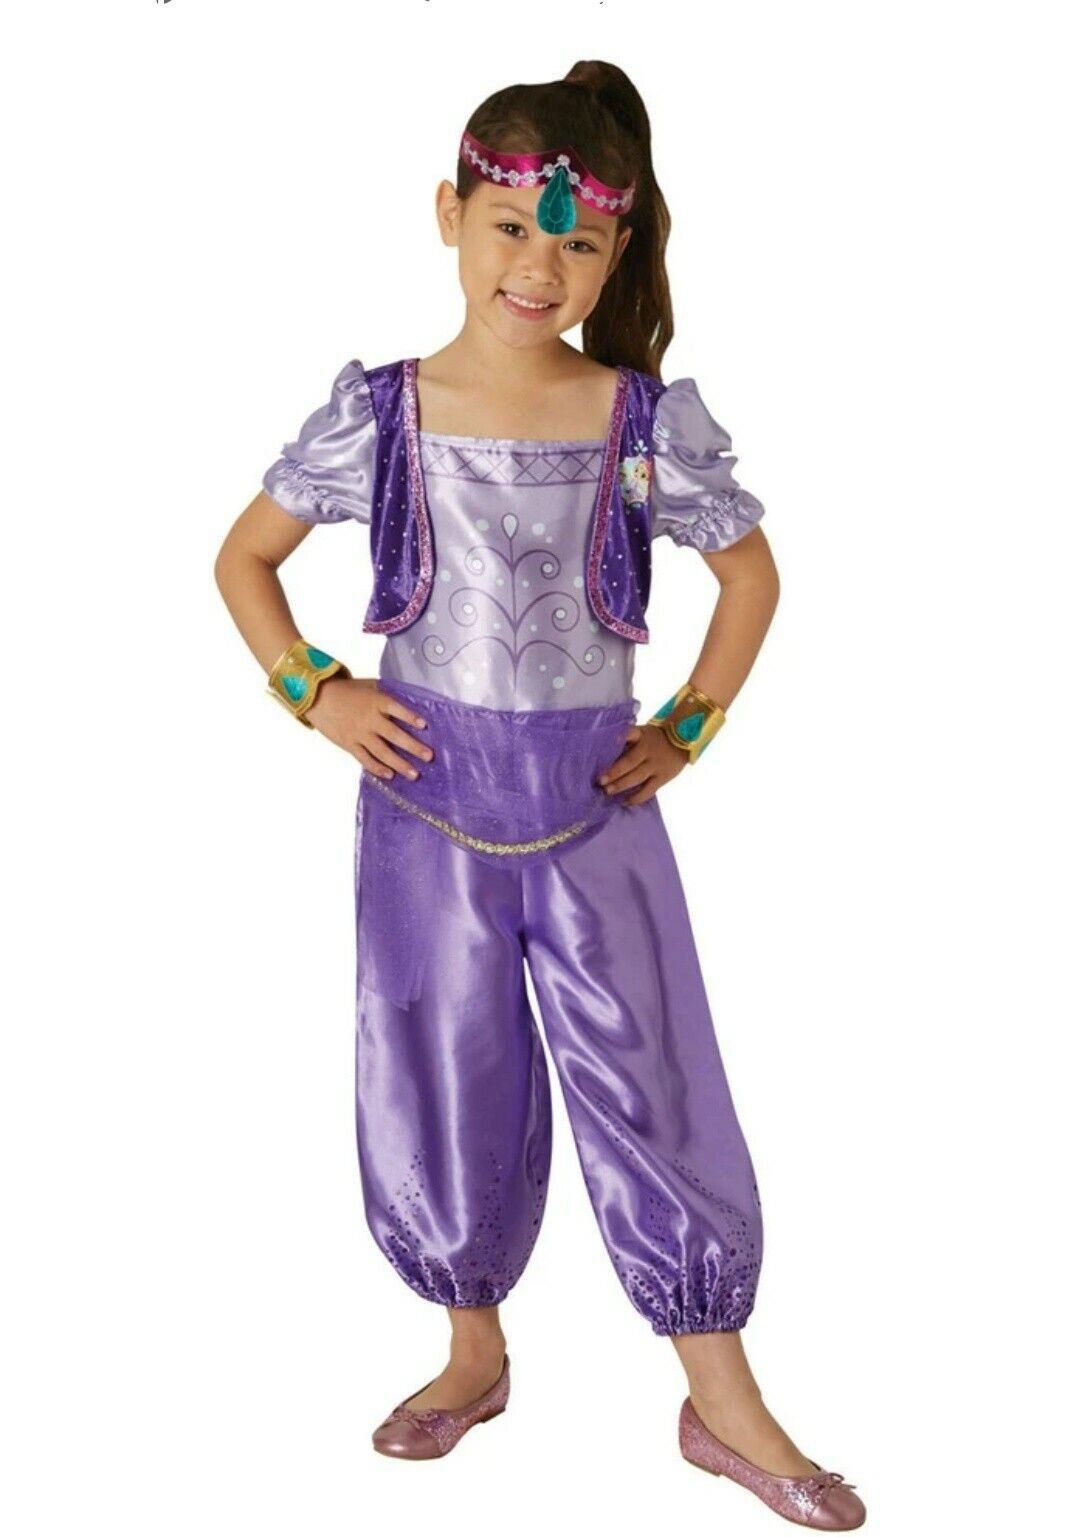 RUBIES GIRLS SHIMMER & SHINE PURPLE SHIMMER FANCY DRESS COSTUME AGE 5-6 MEDIUM